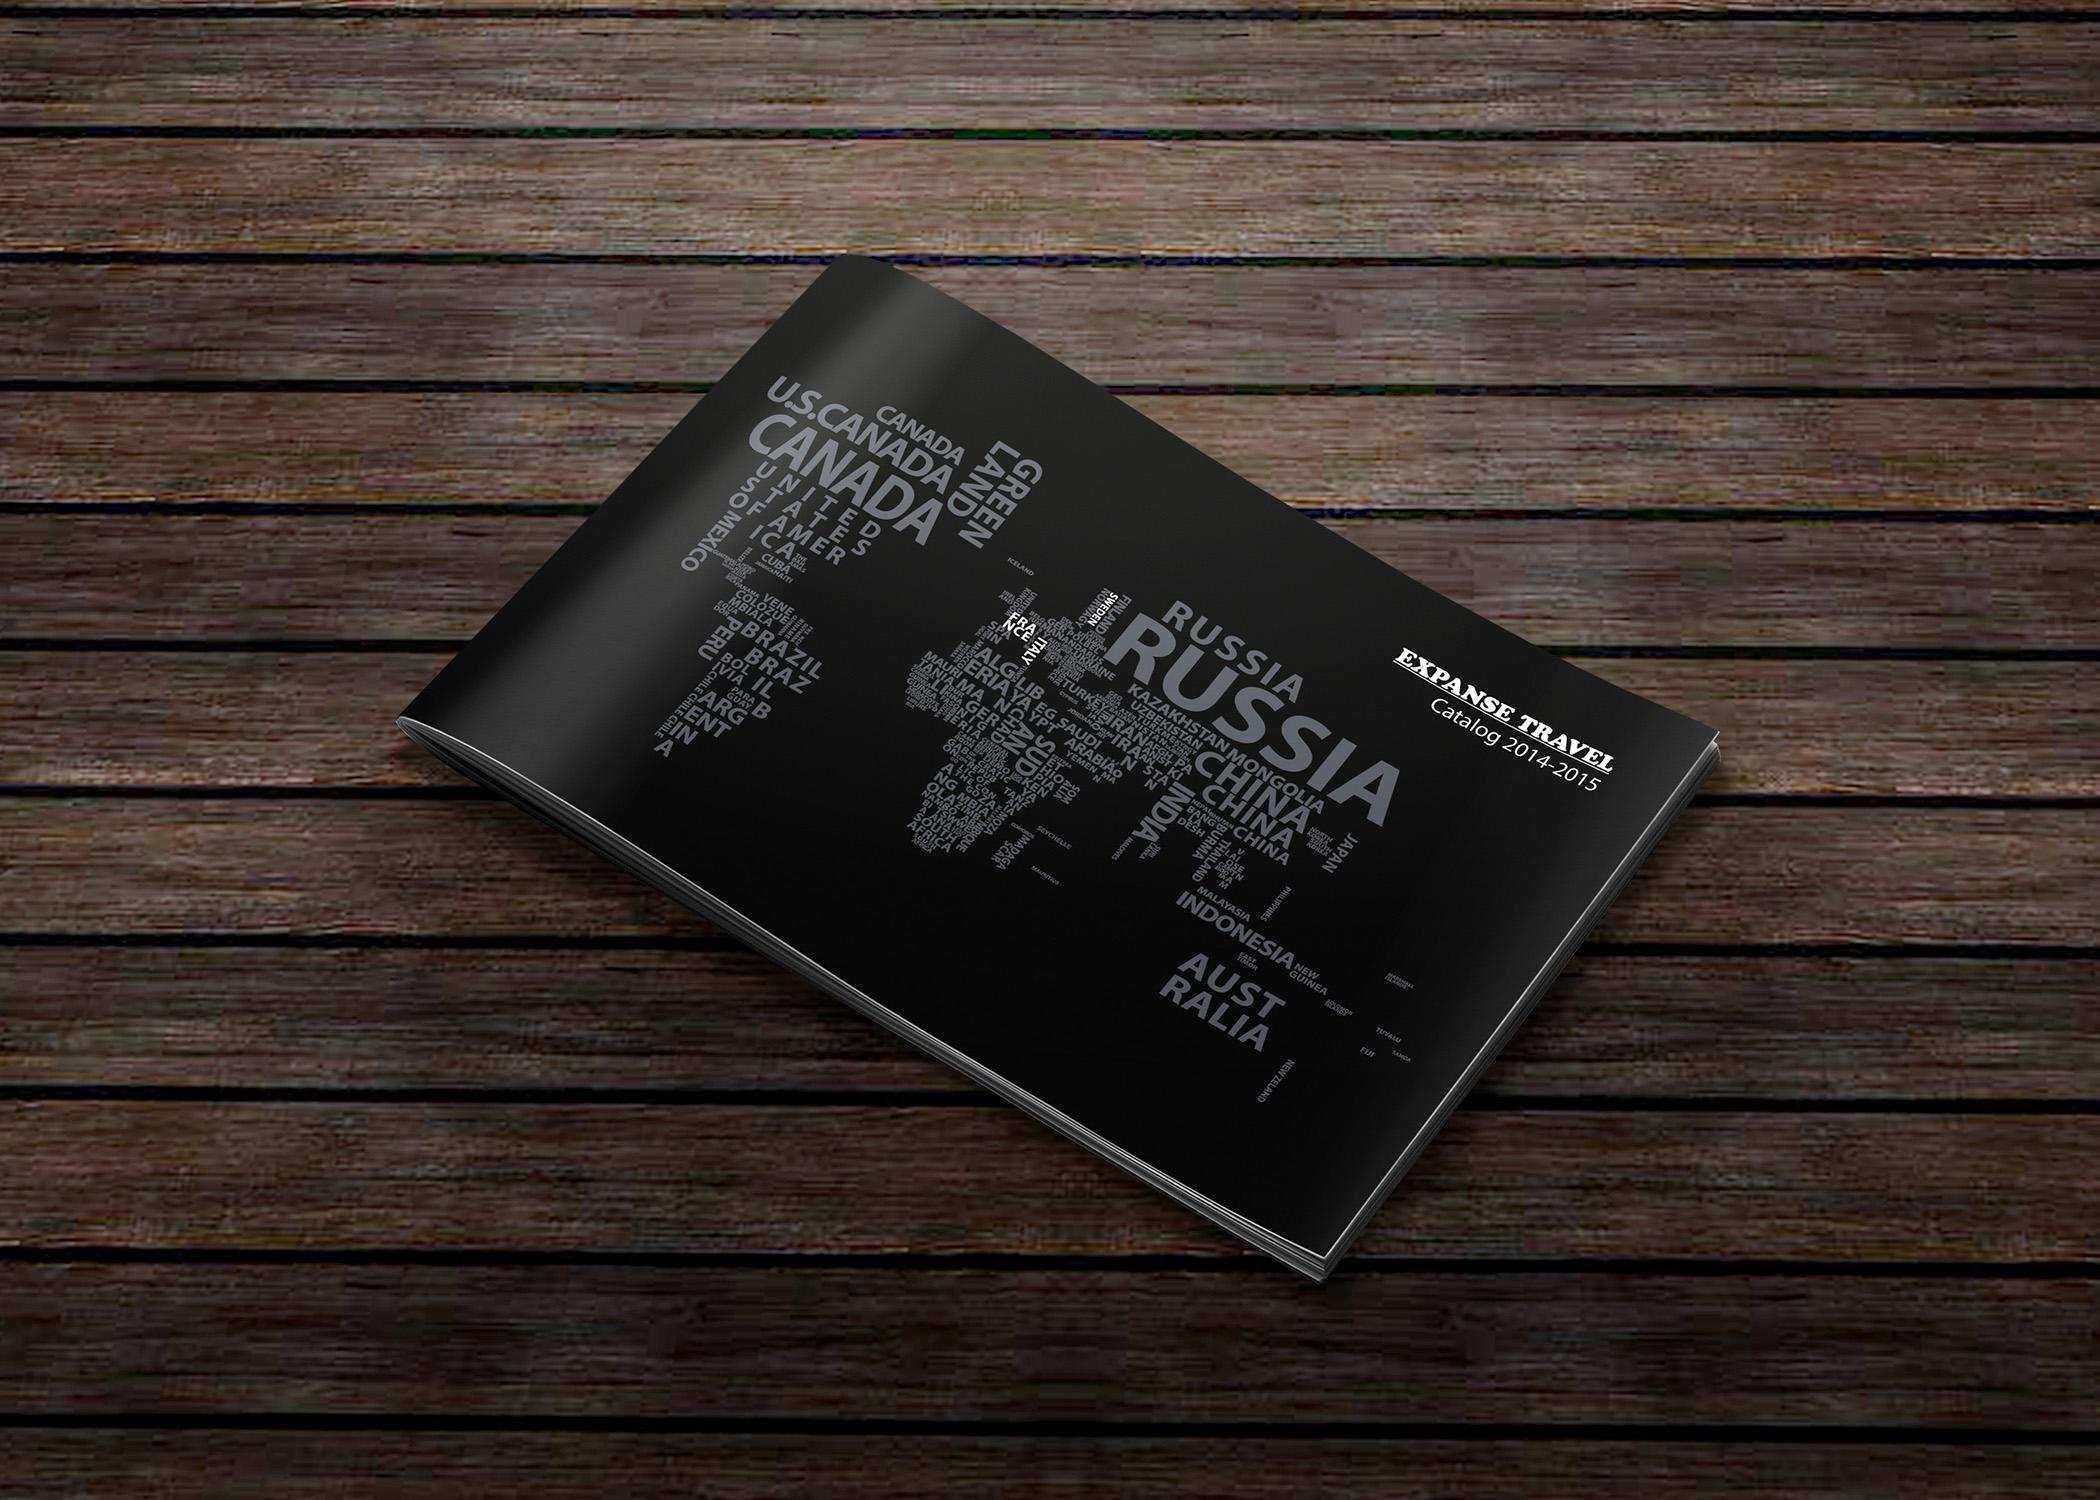 Expanse Travel создание журнала